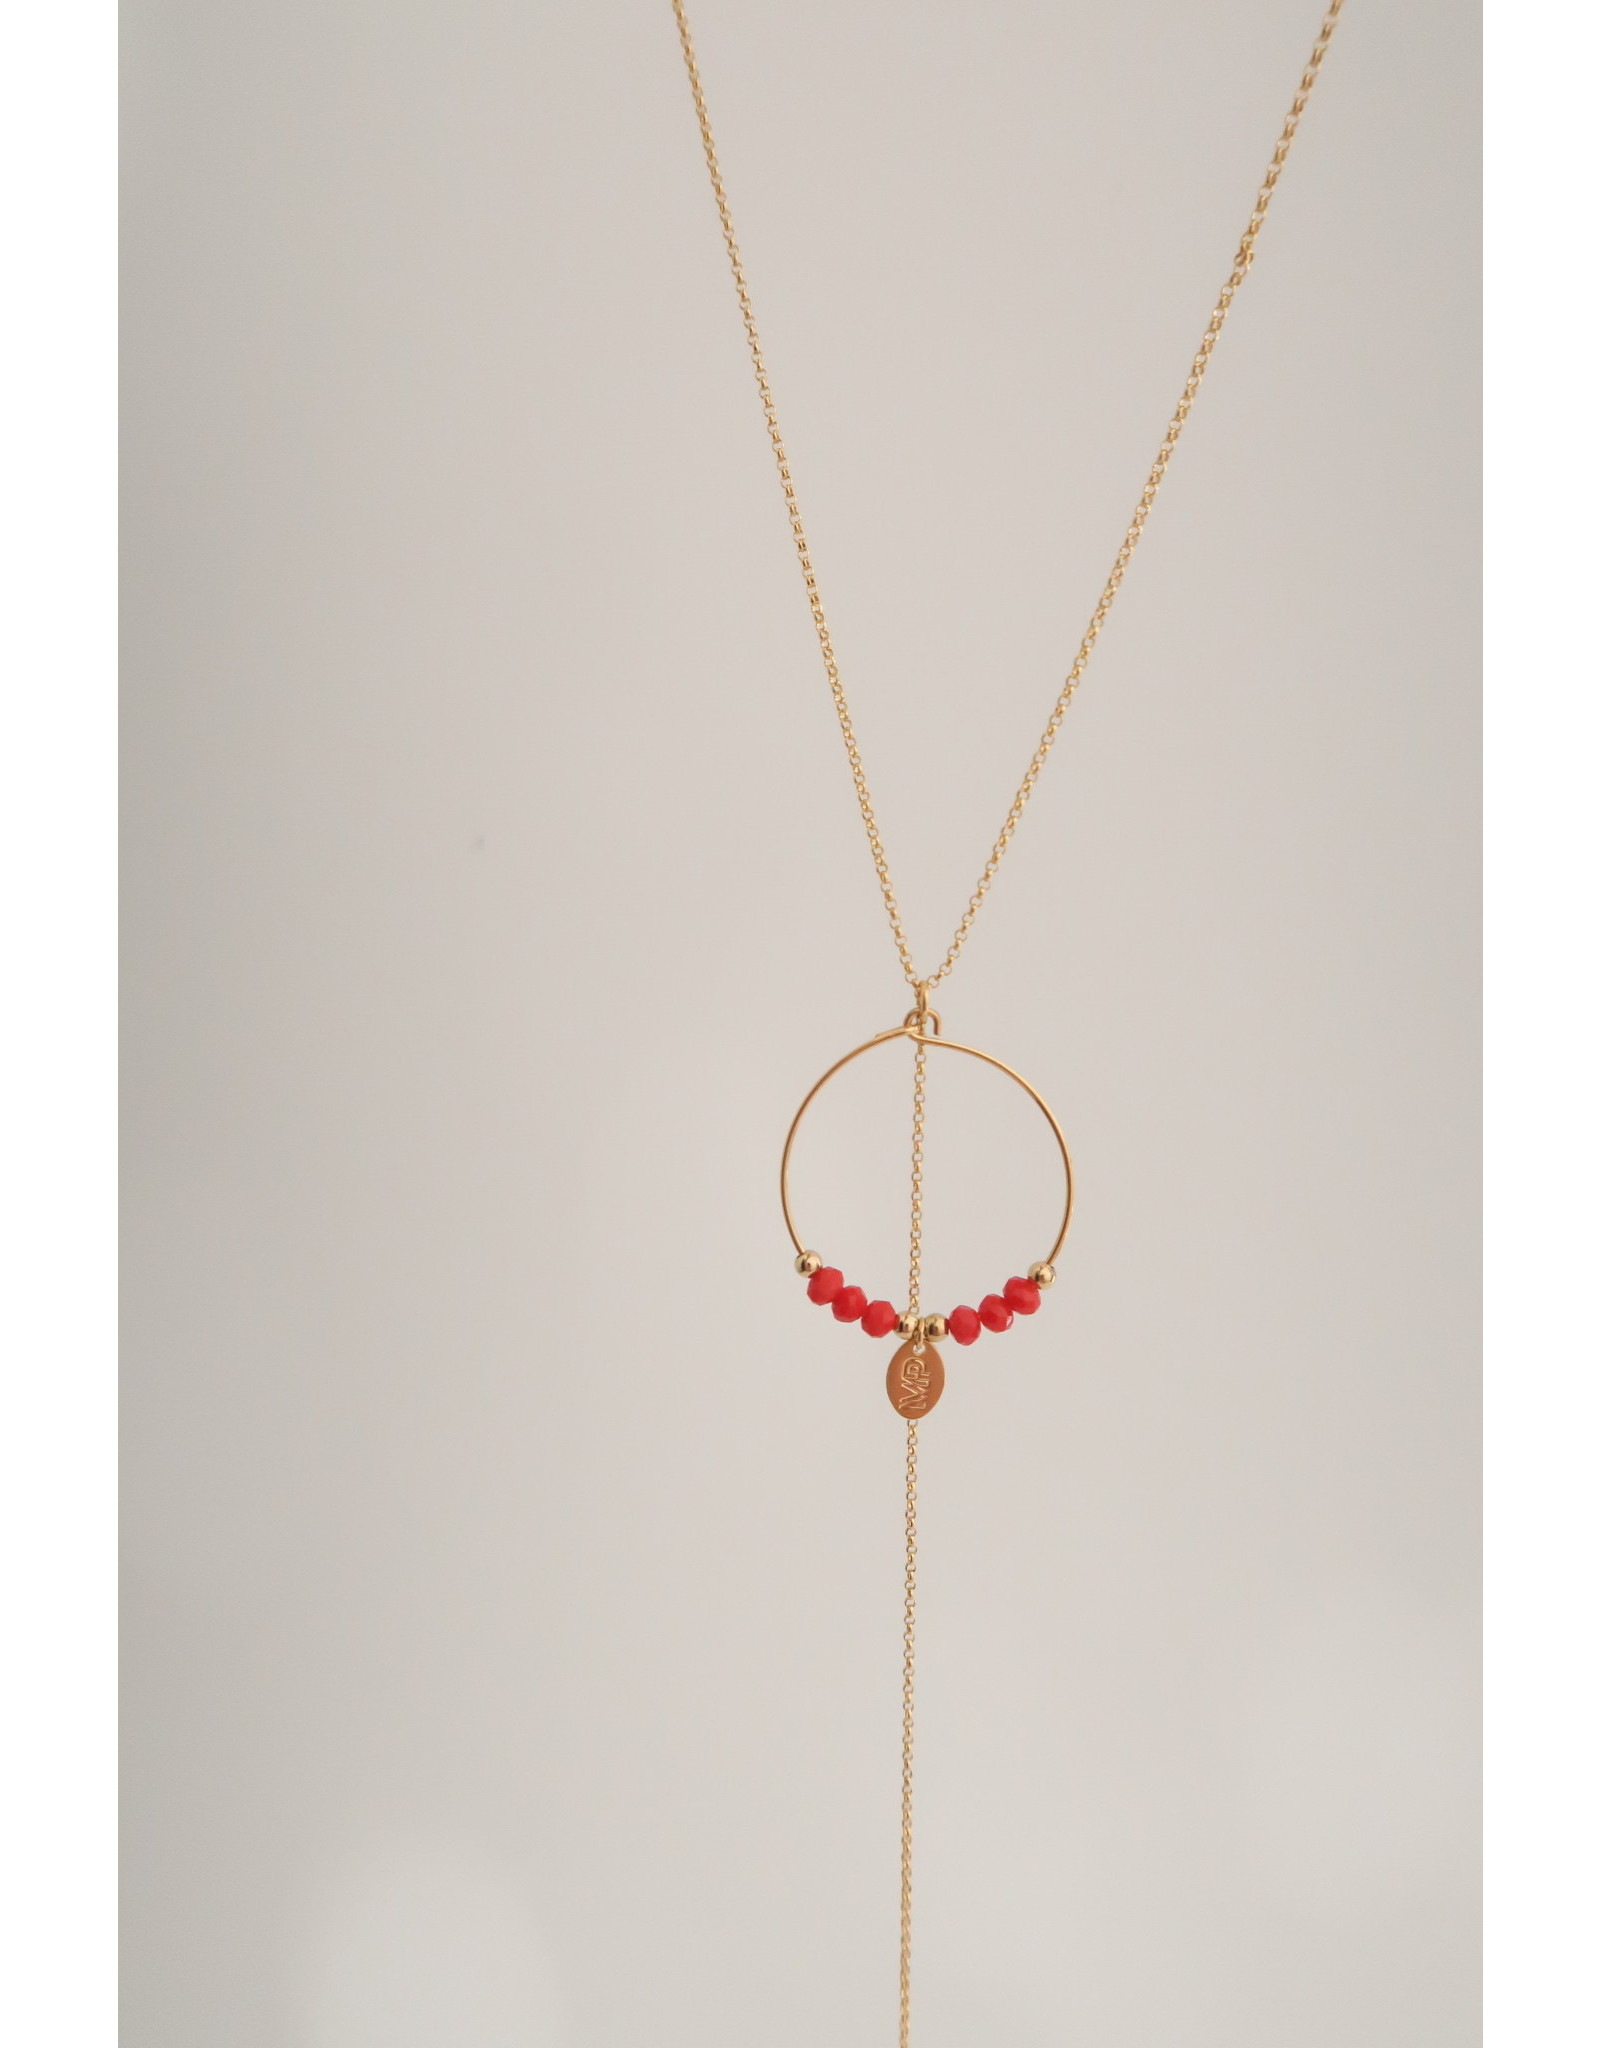 Murielle Perotti halsketting MP rood creool/goud 50cm